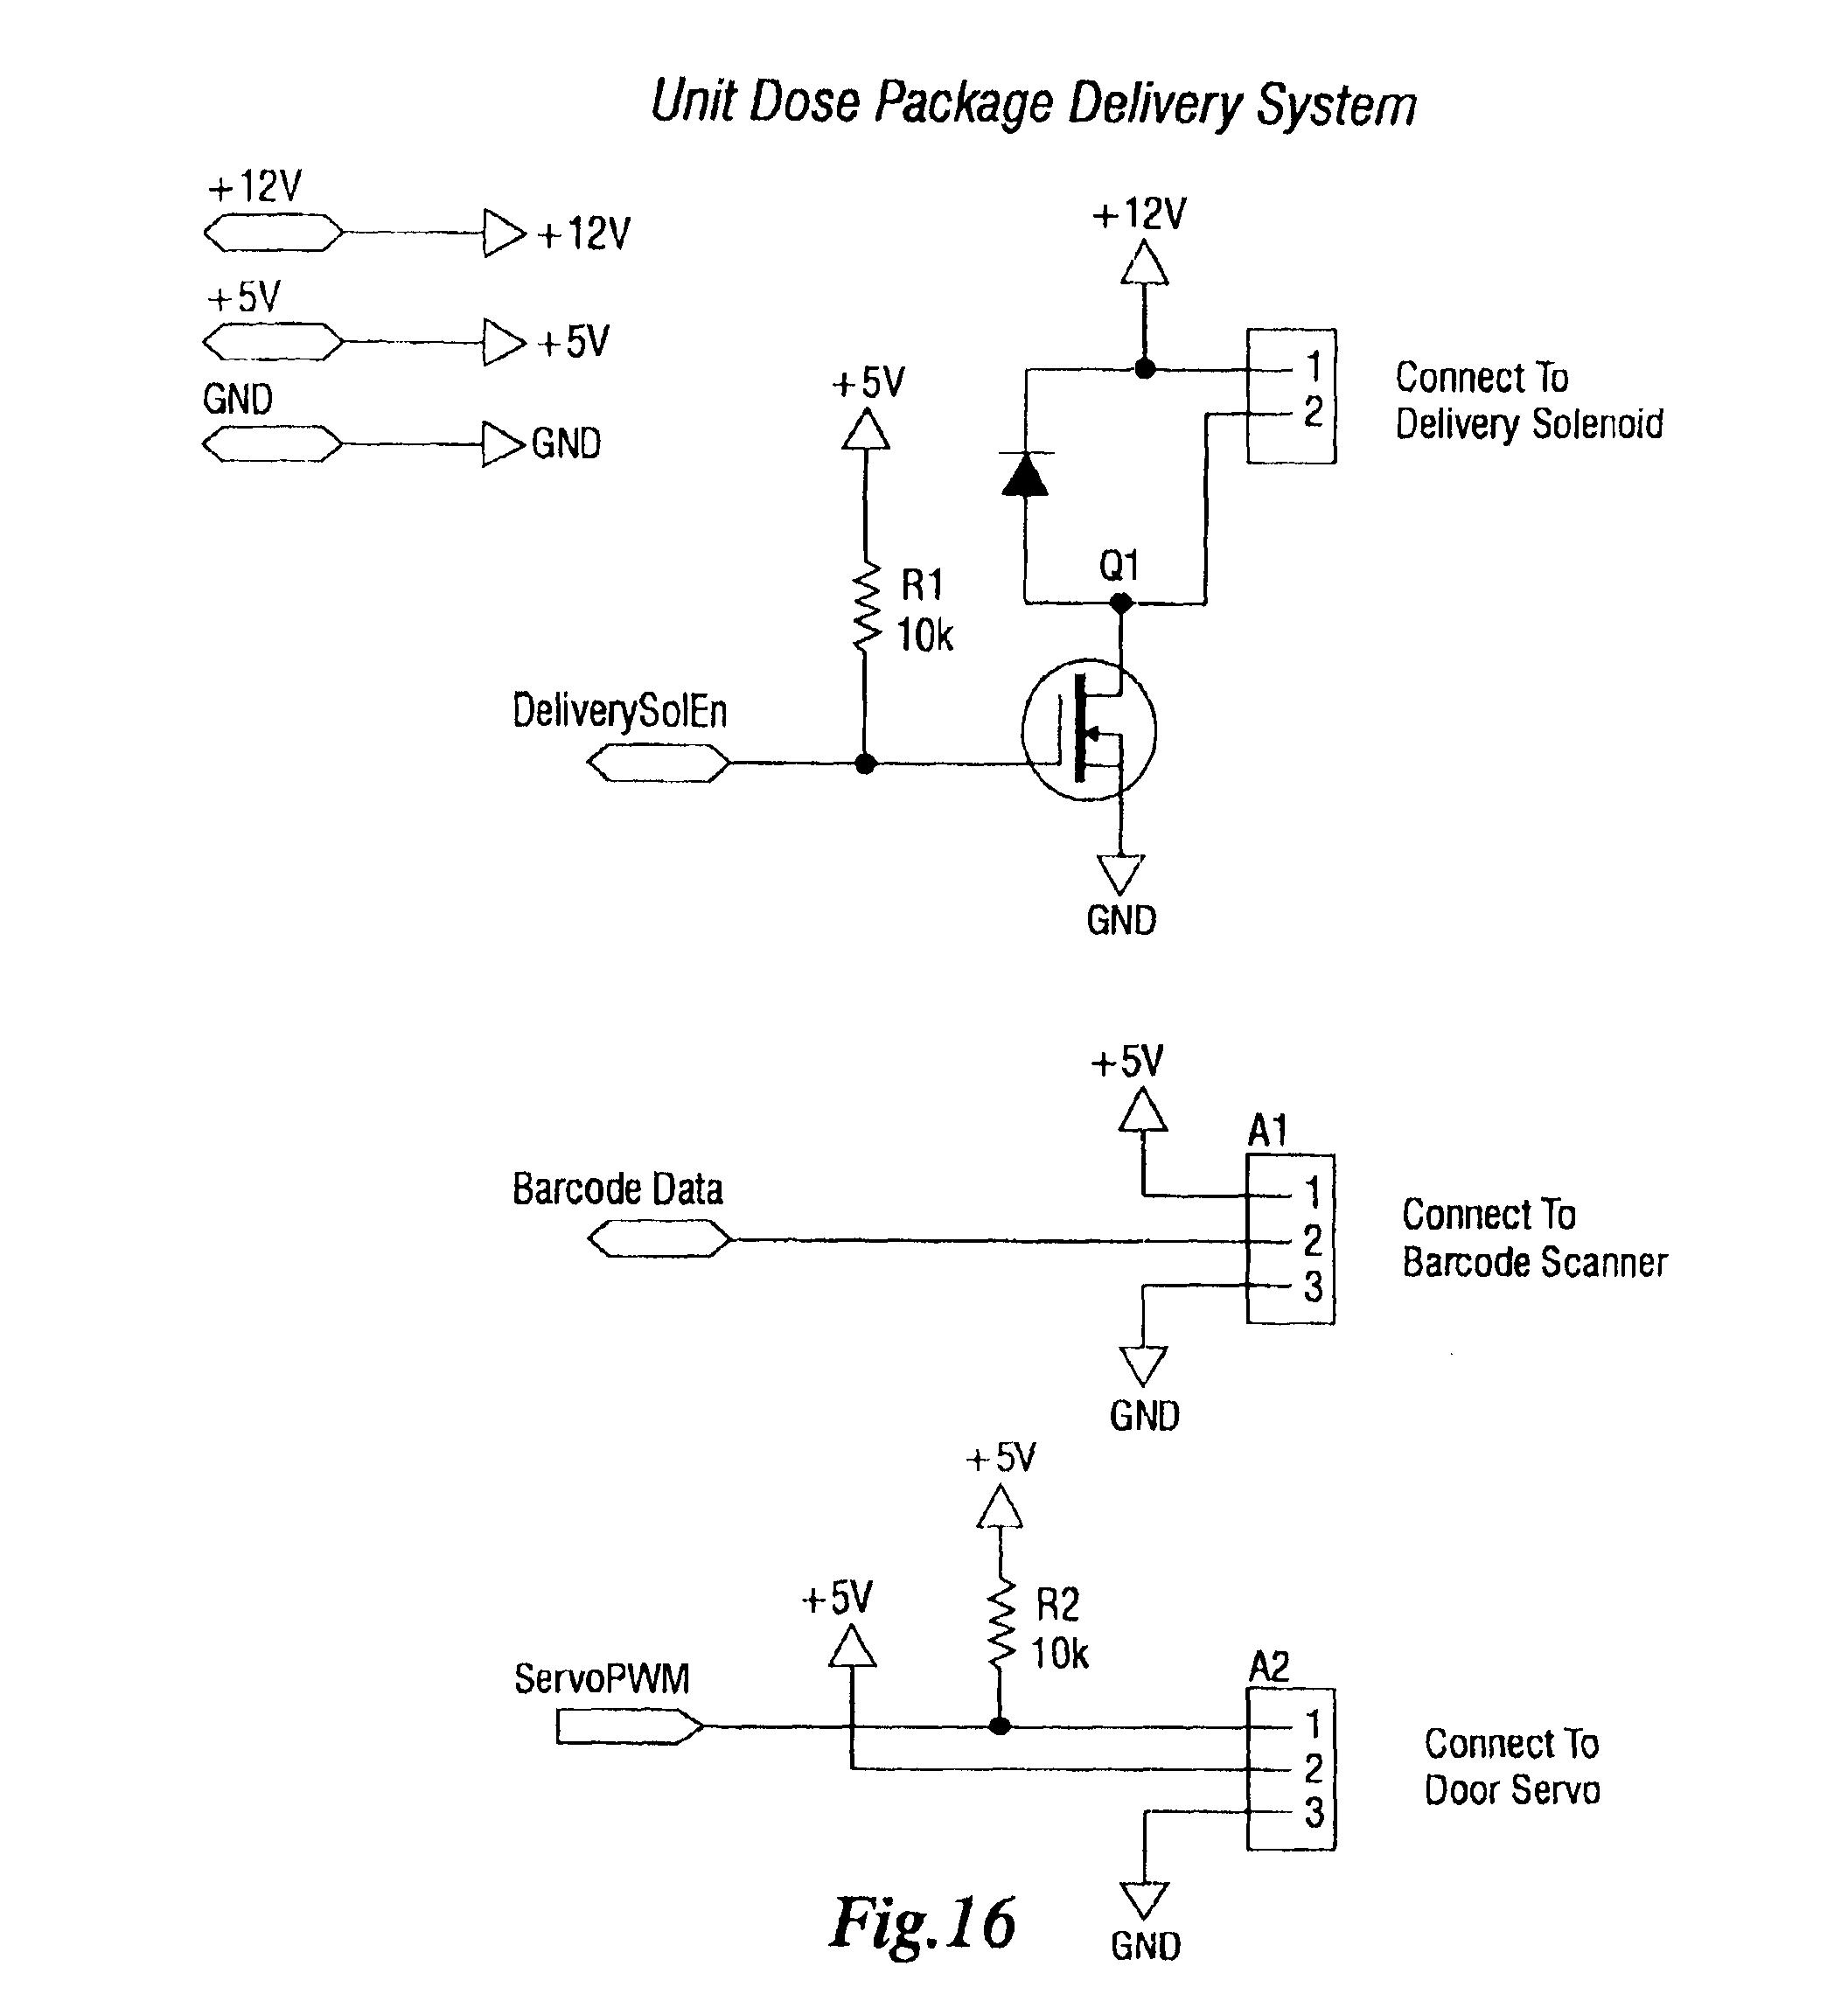 Patent US 7,828,147 B2